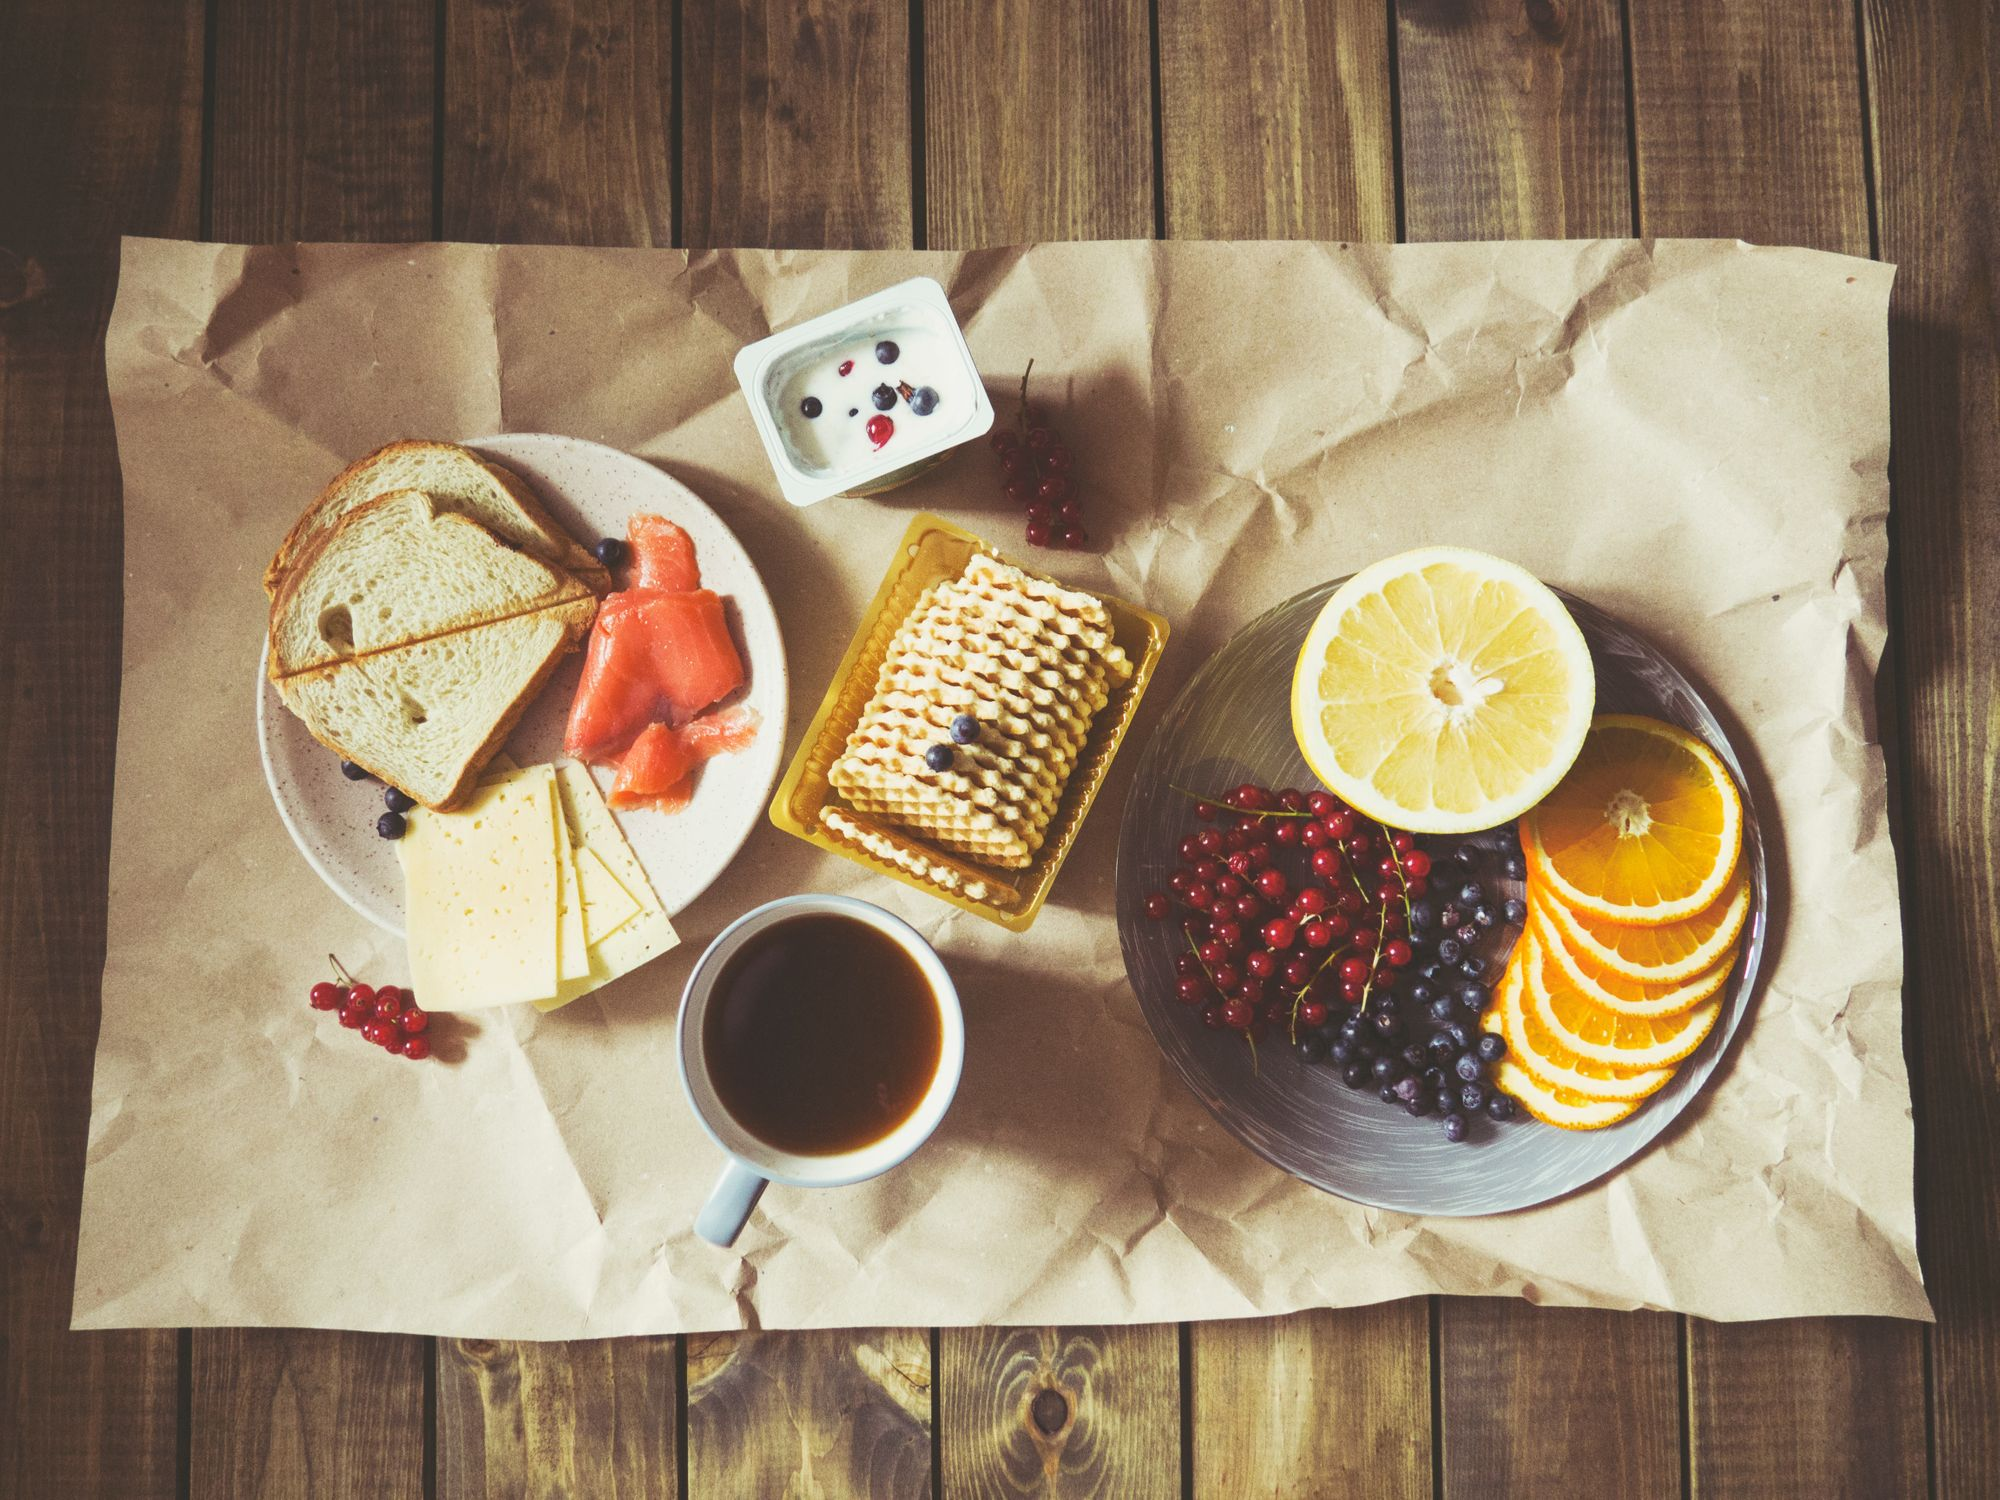 Snacks: o que tem pro lanche?